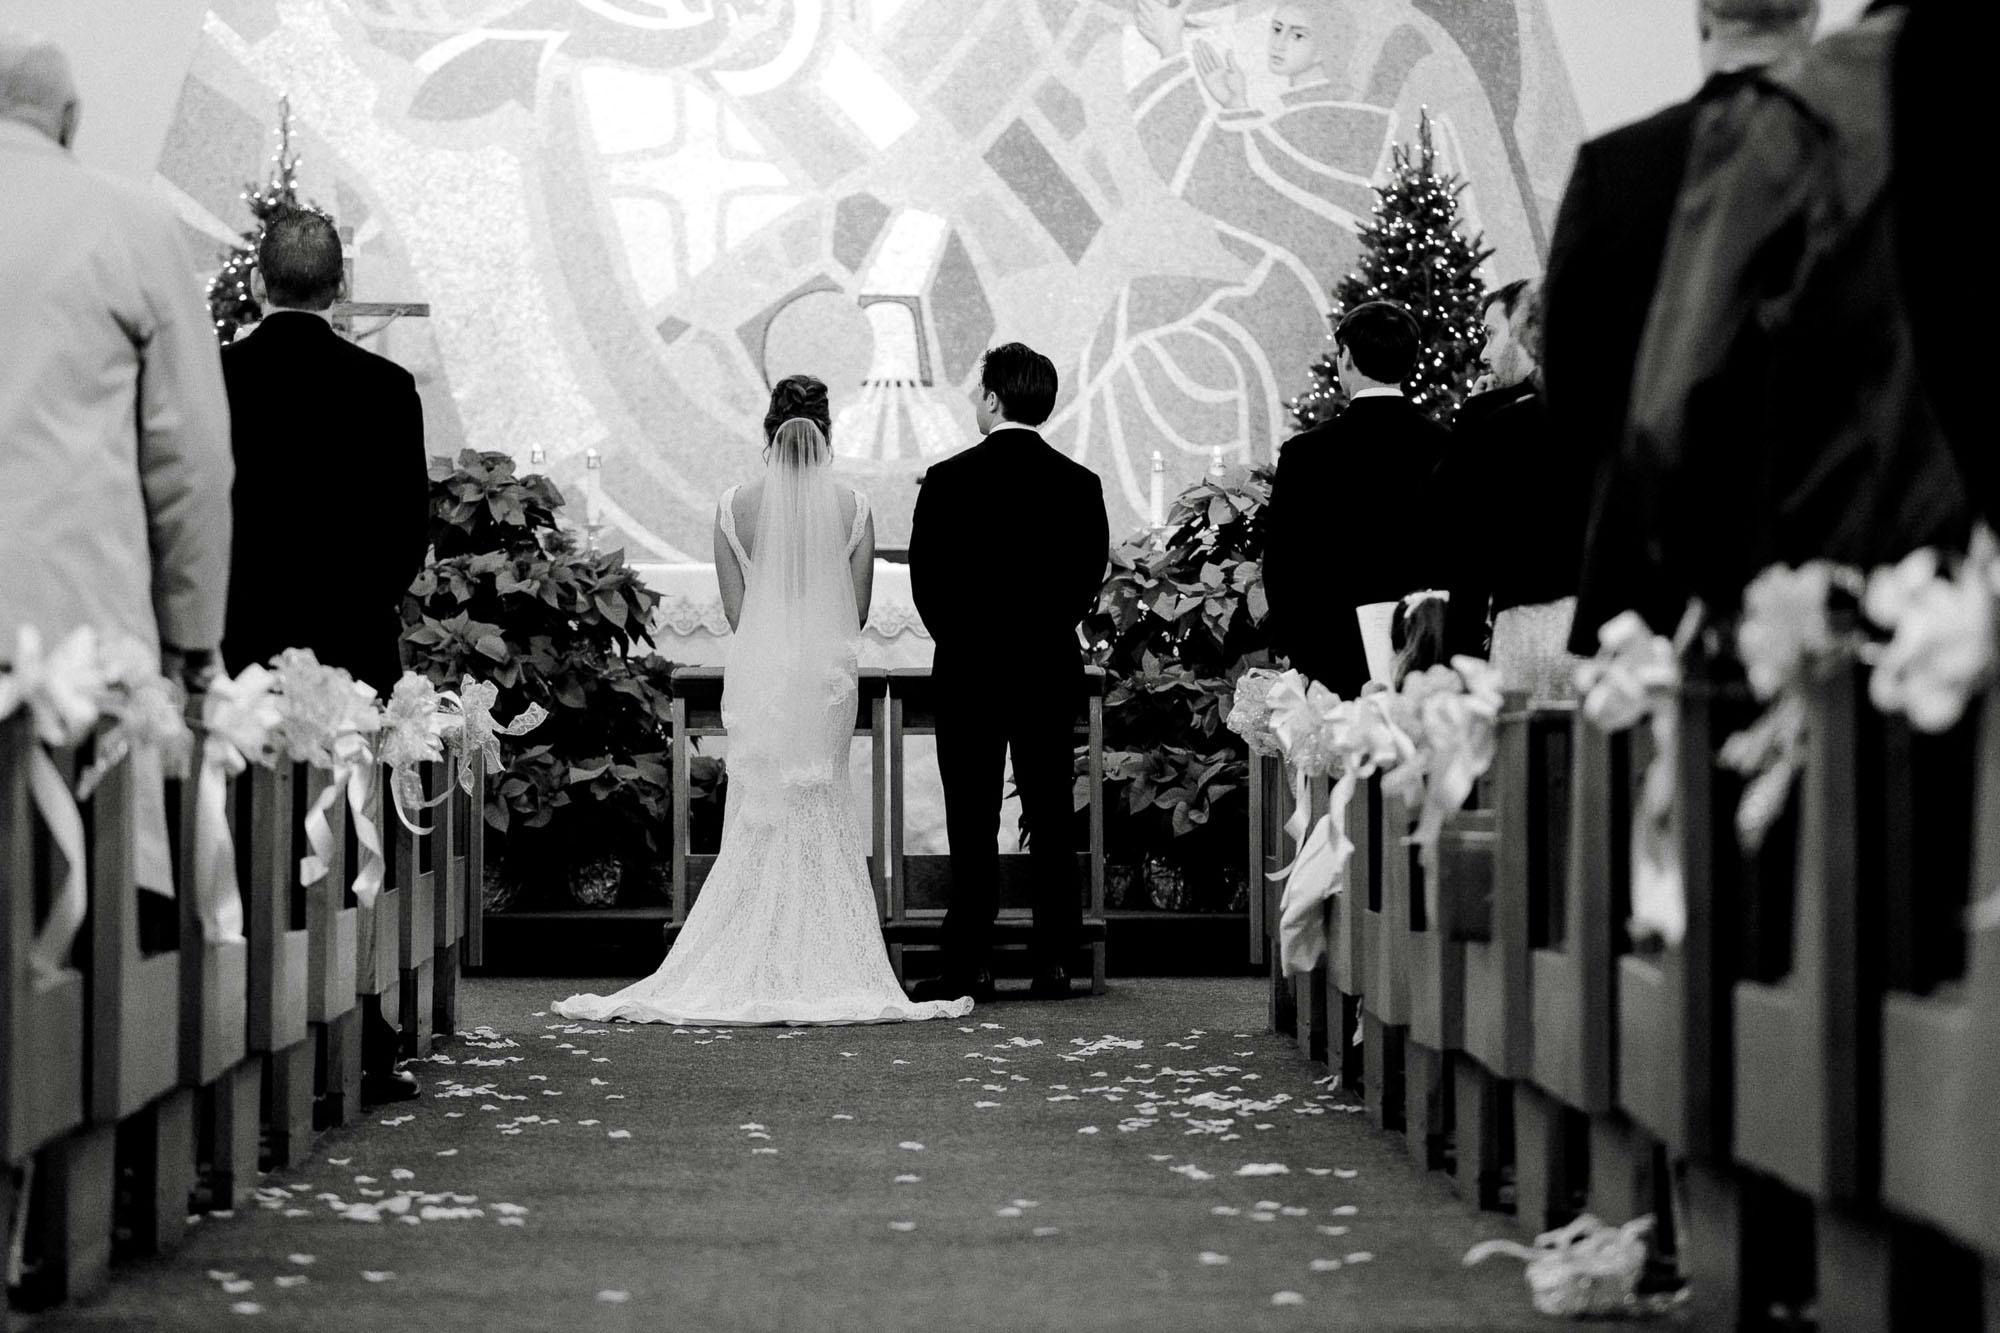 snowy-sand-springs-country-club-drums-pa-christmas-wedding-24314.jpg